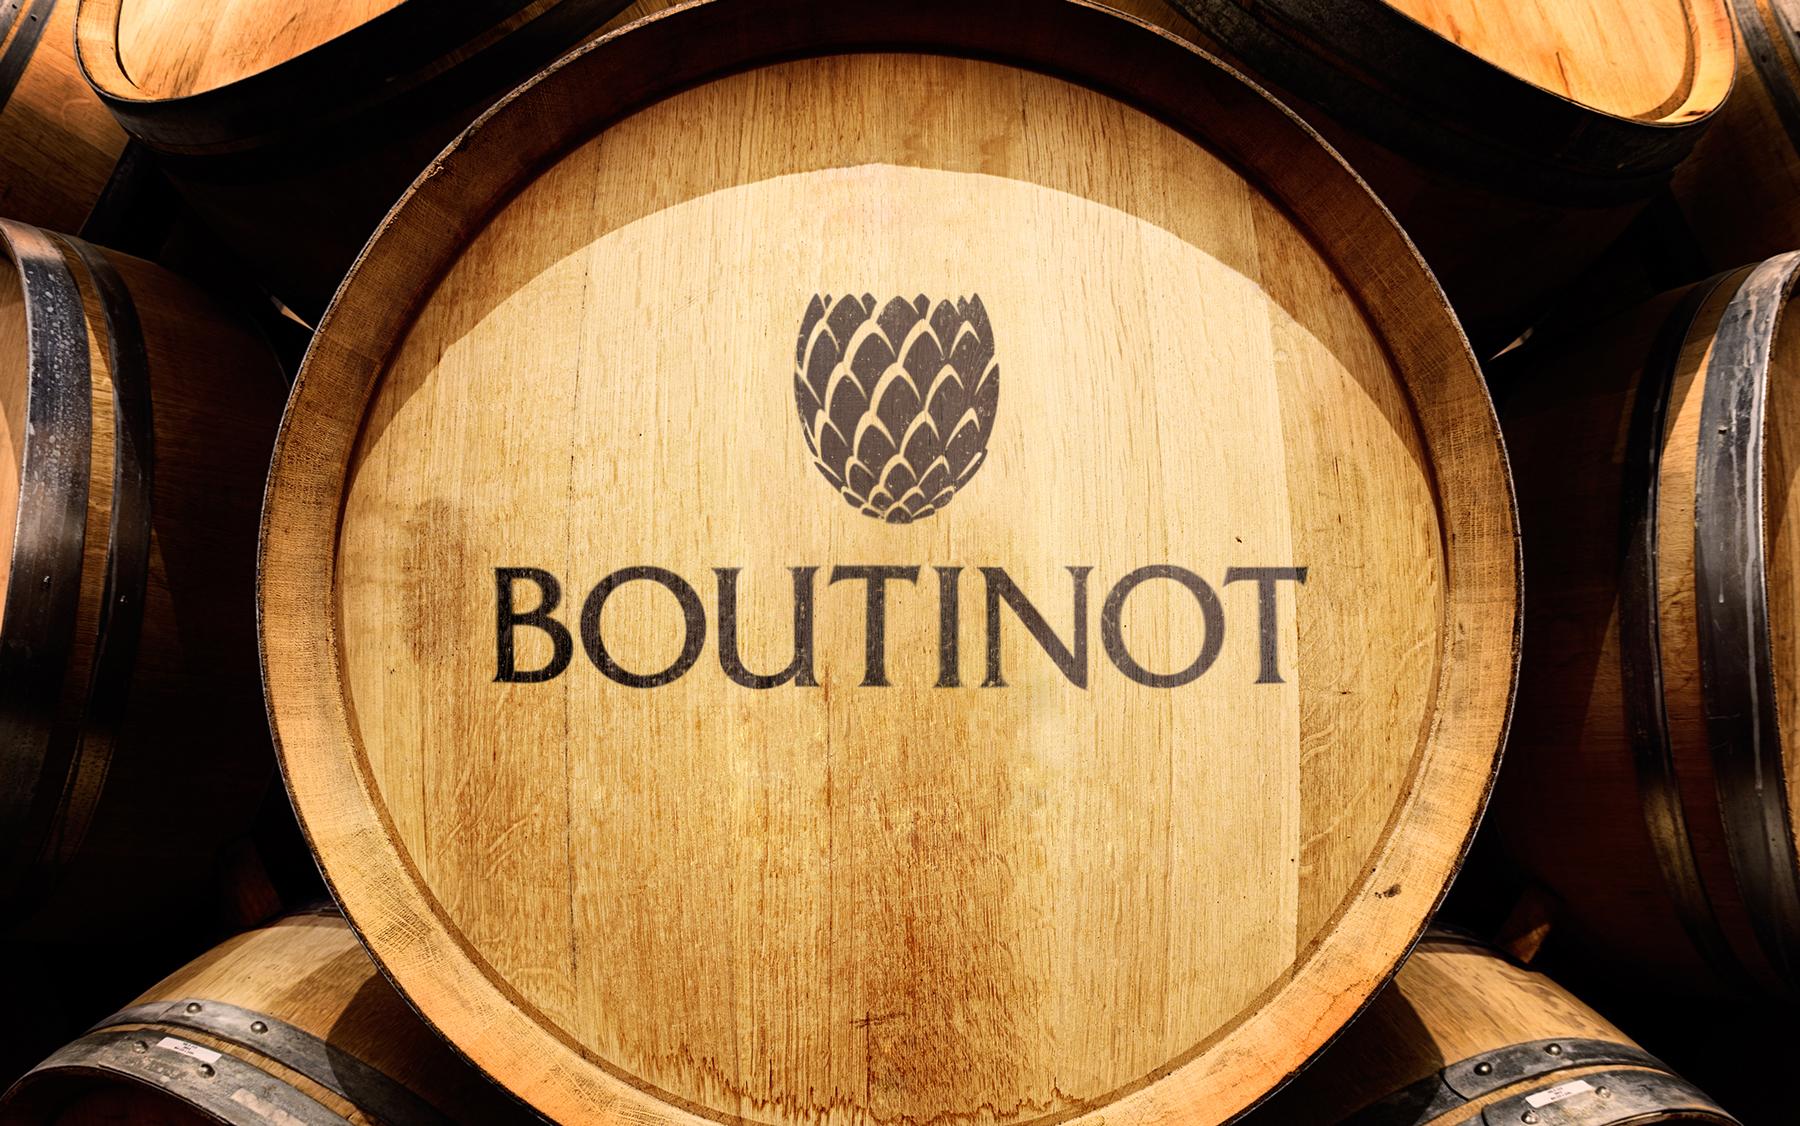 Lifestyle shot featuring Boutinot logo design